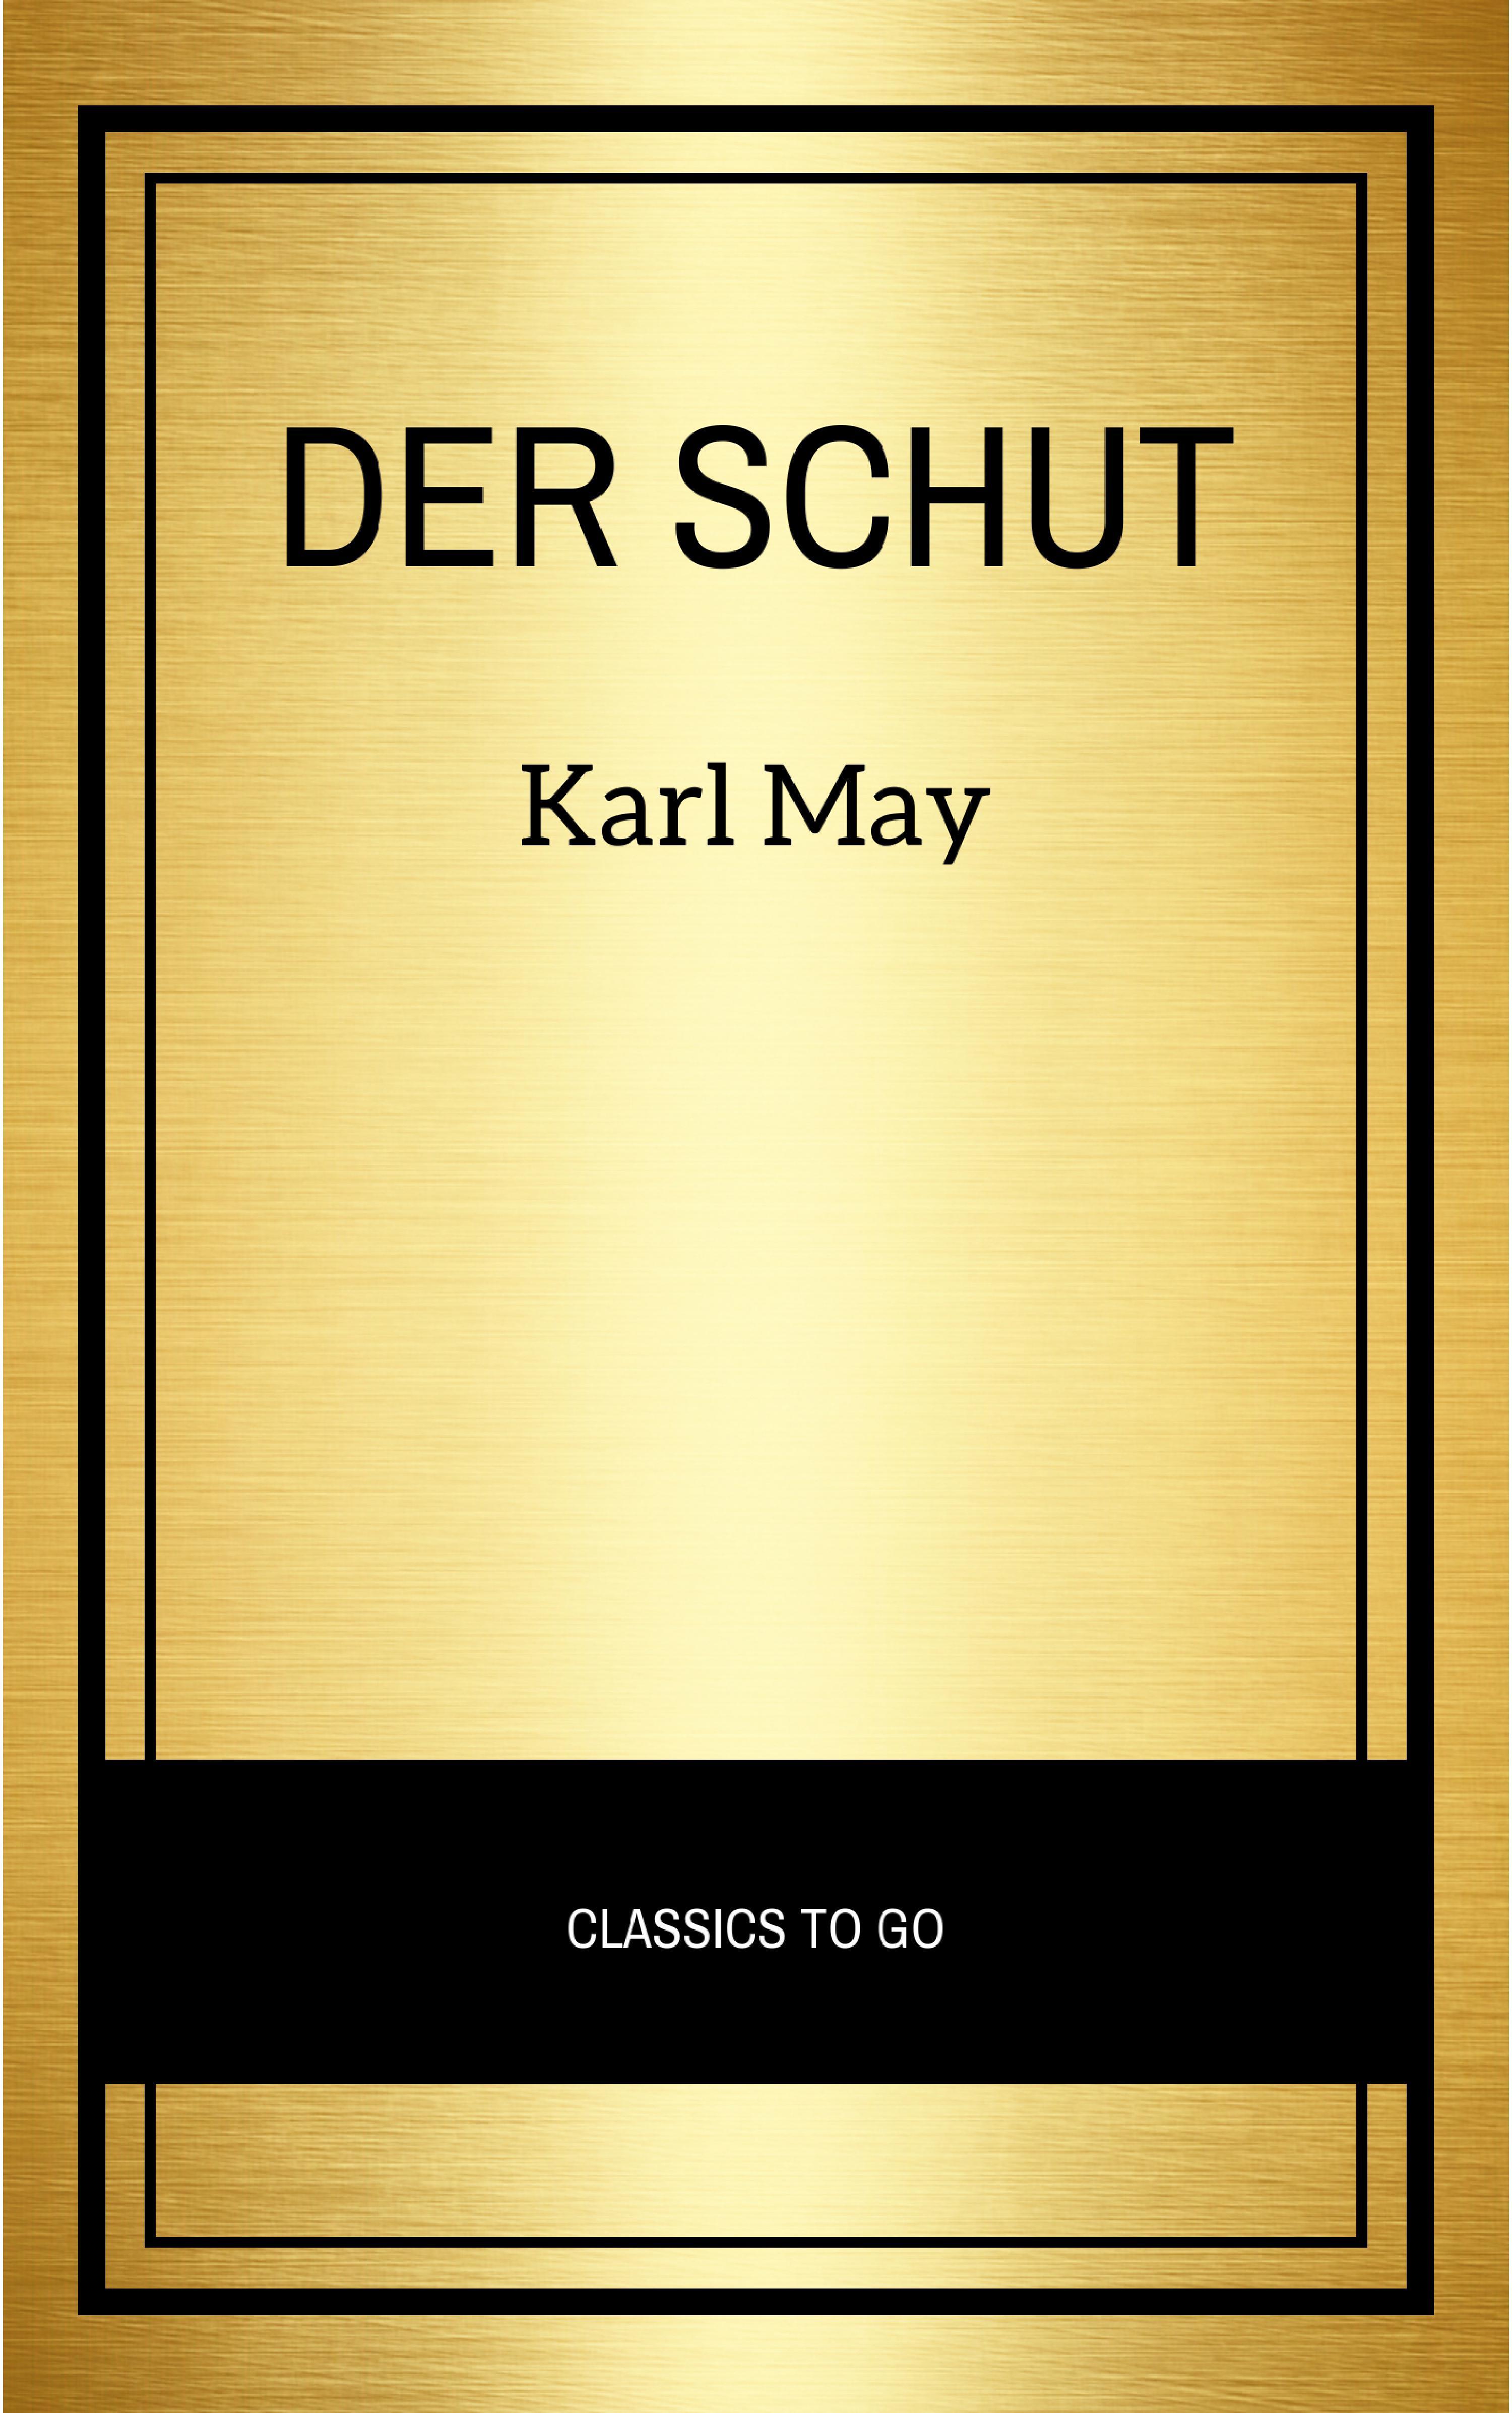 цена Karl May Der Schut онлайн в 2017 году